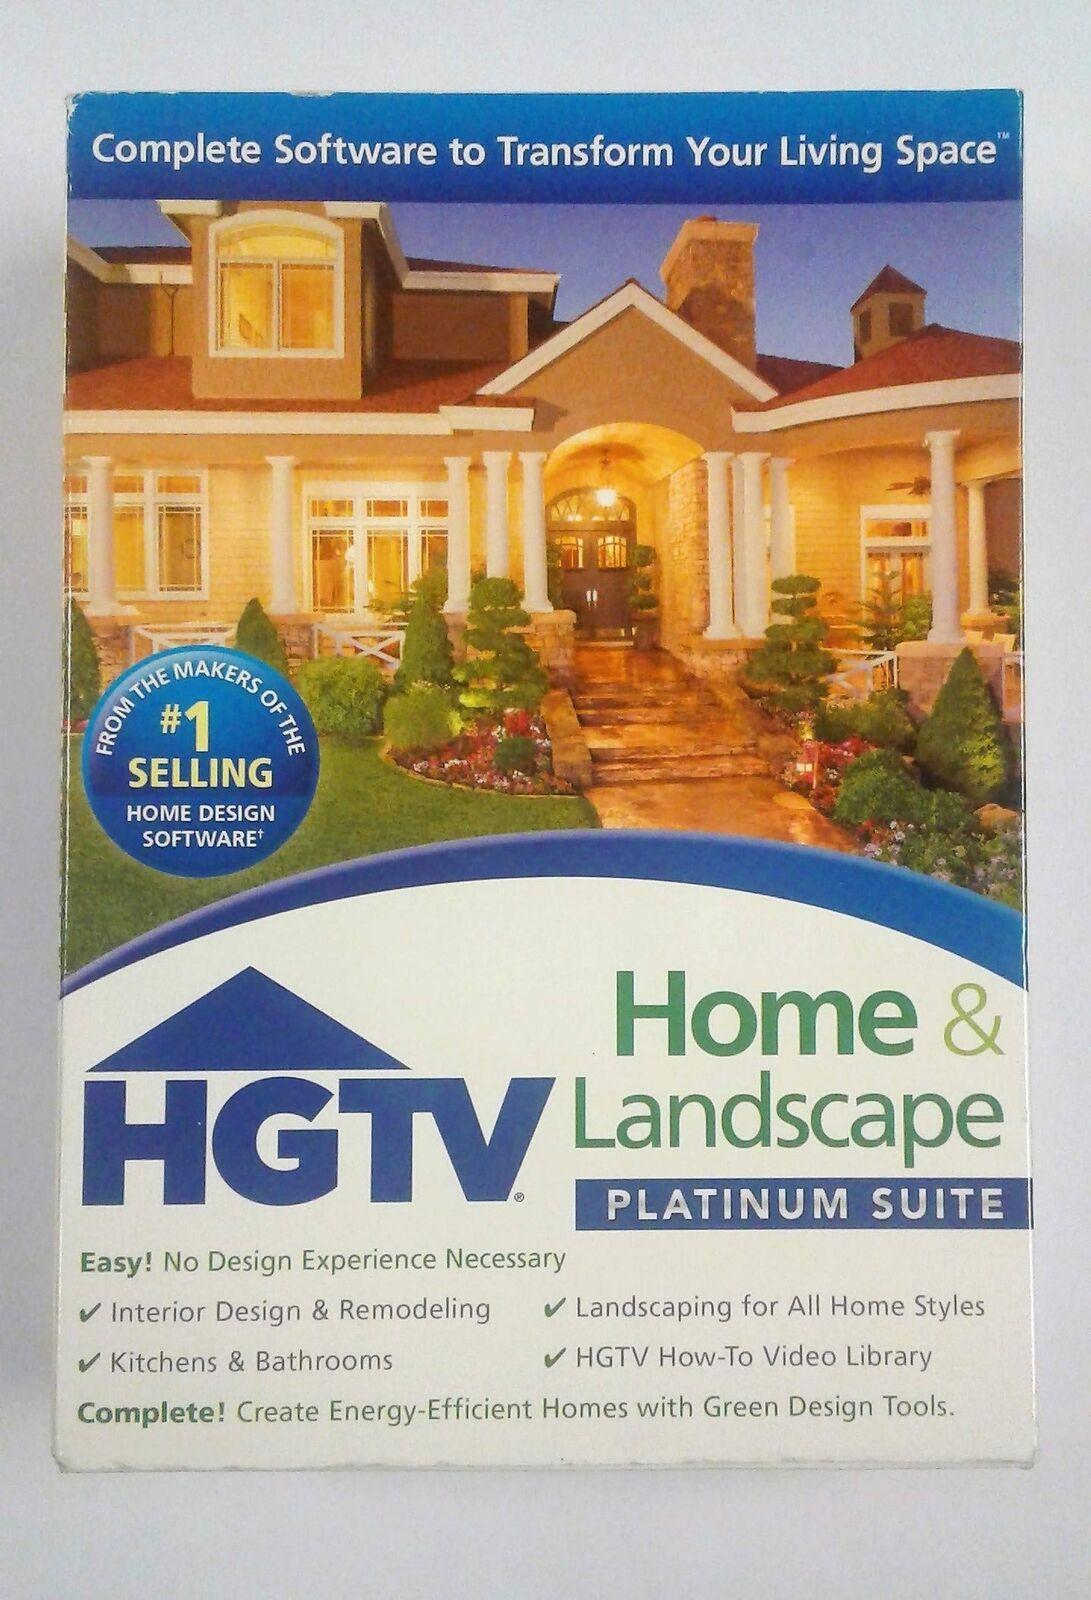 Virtual Architect Home Landscape Platinum Suite Software Cd 42956 Design For Sale Online Ebay